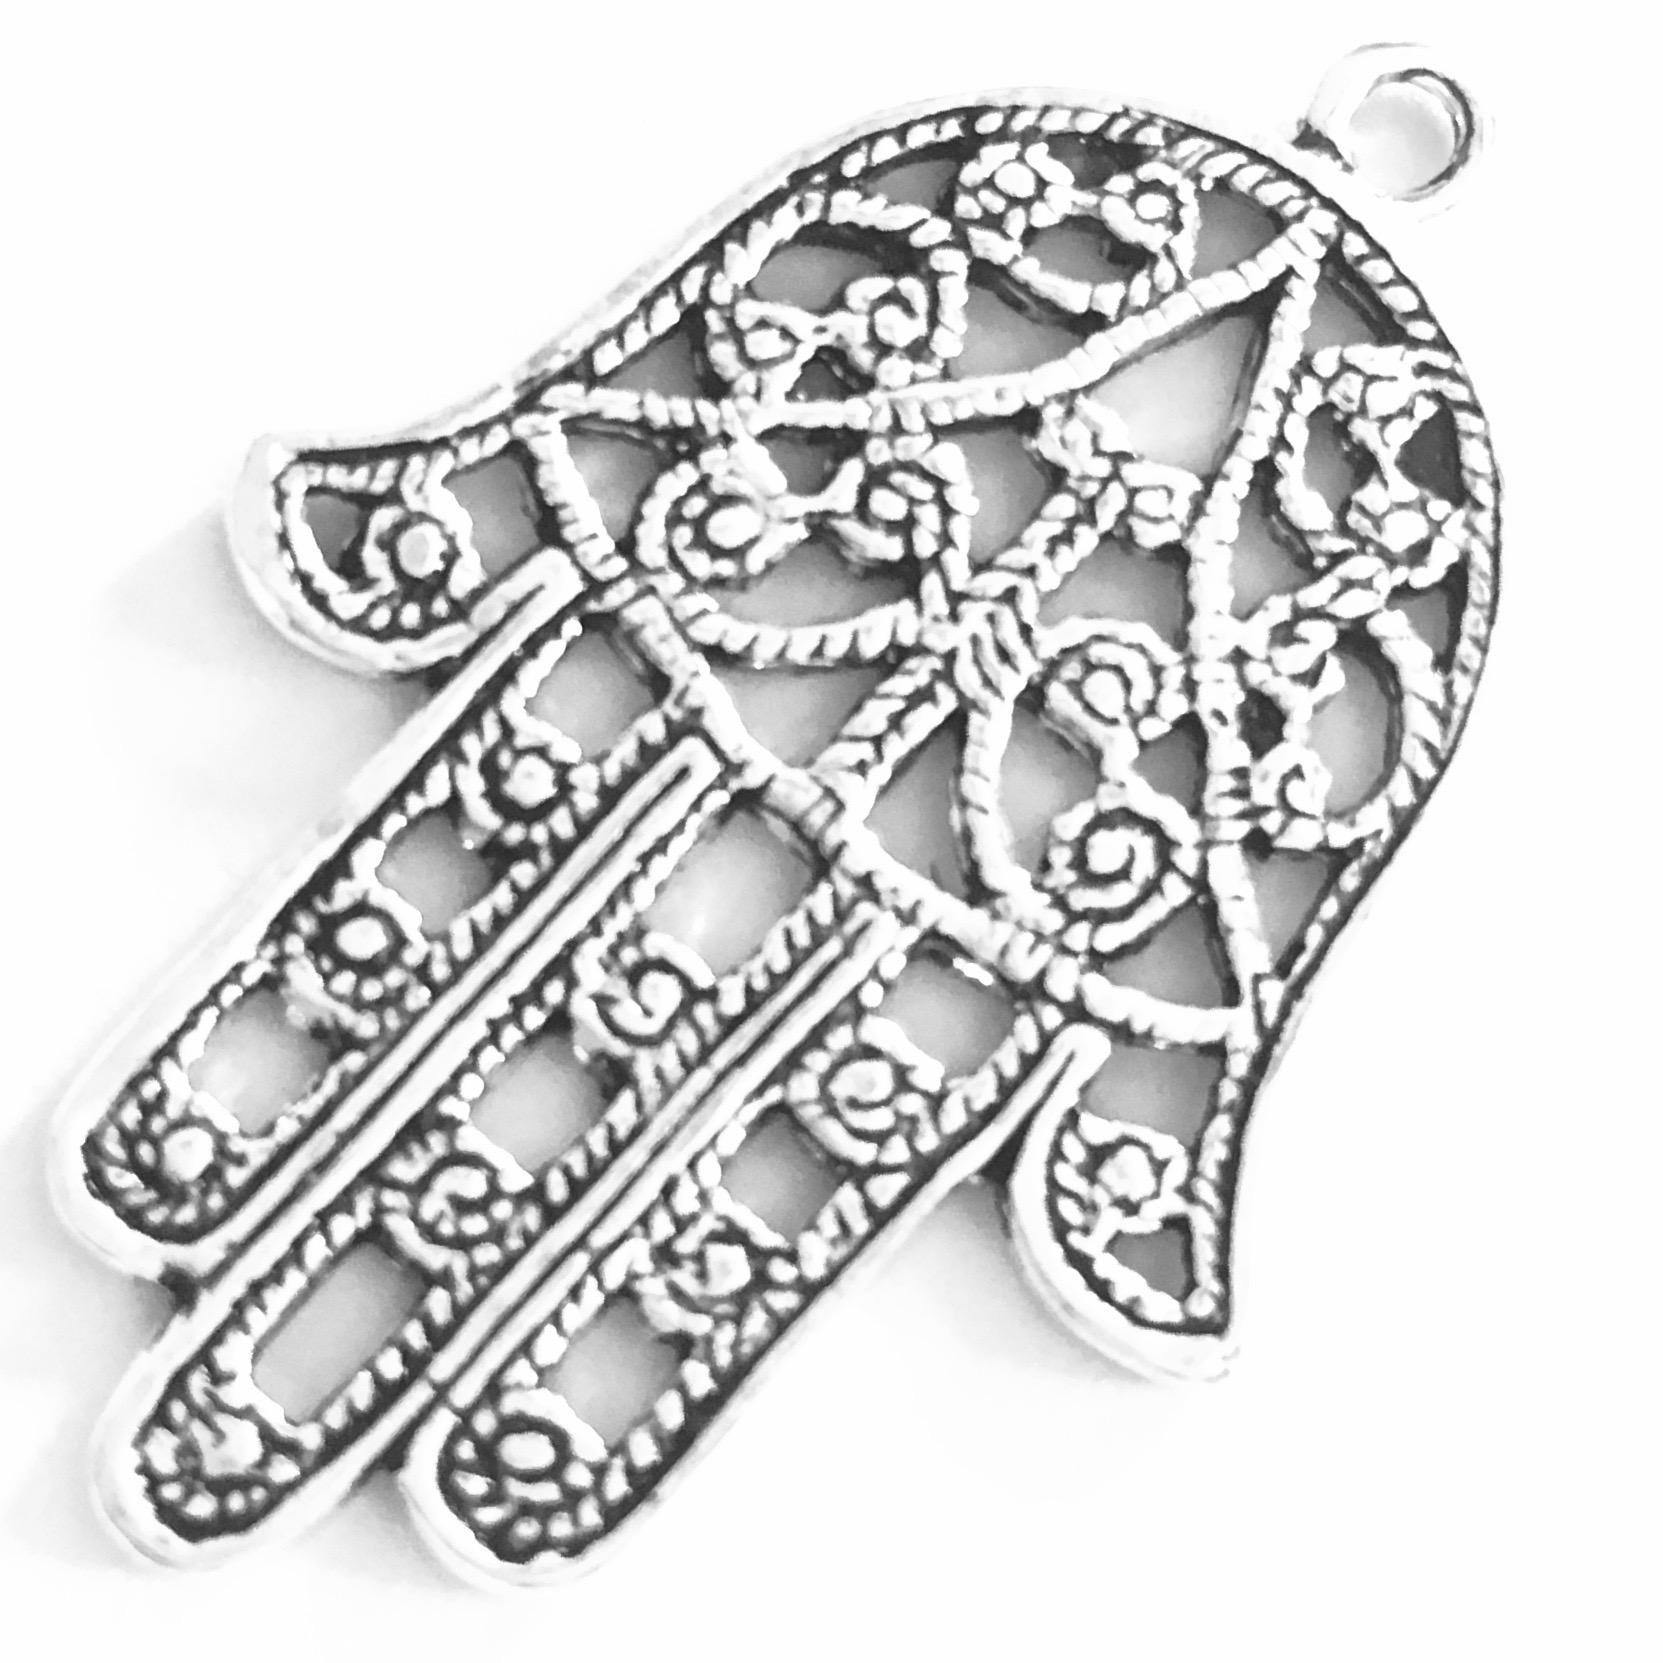 Turkish Sterling Silver Charm Pendant Hamsa 4 cm 6 gram